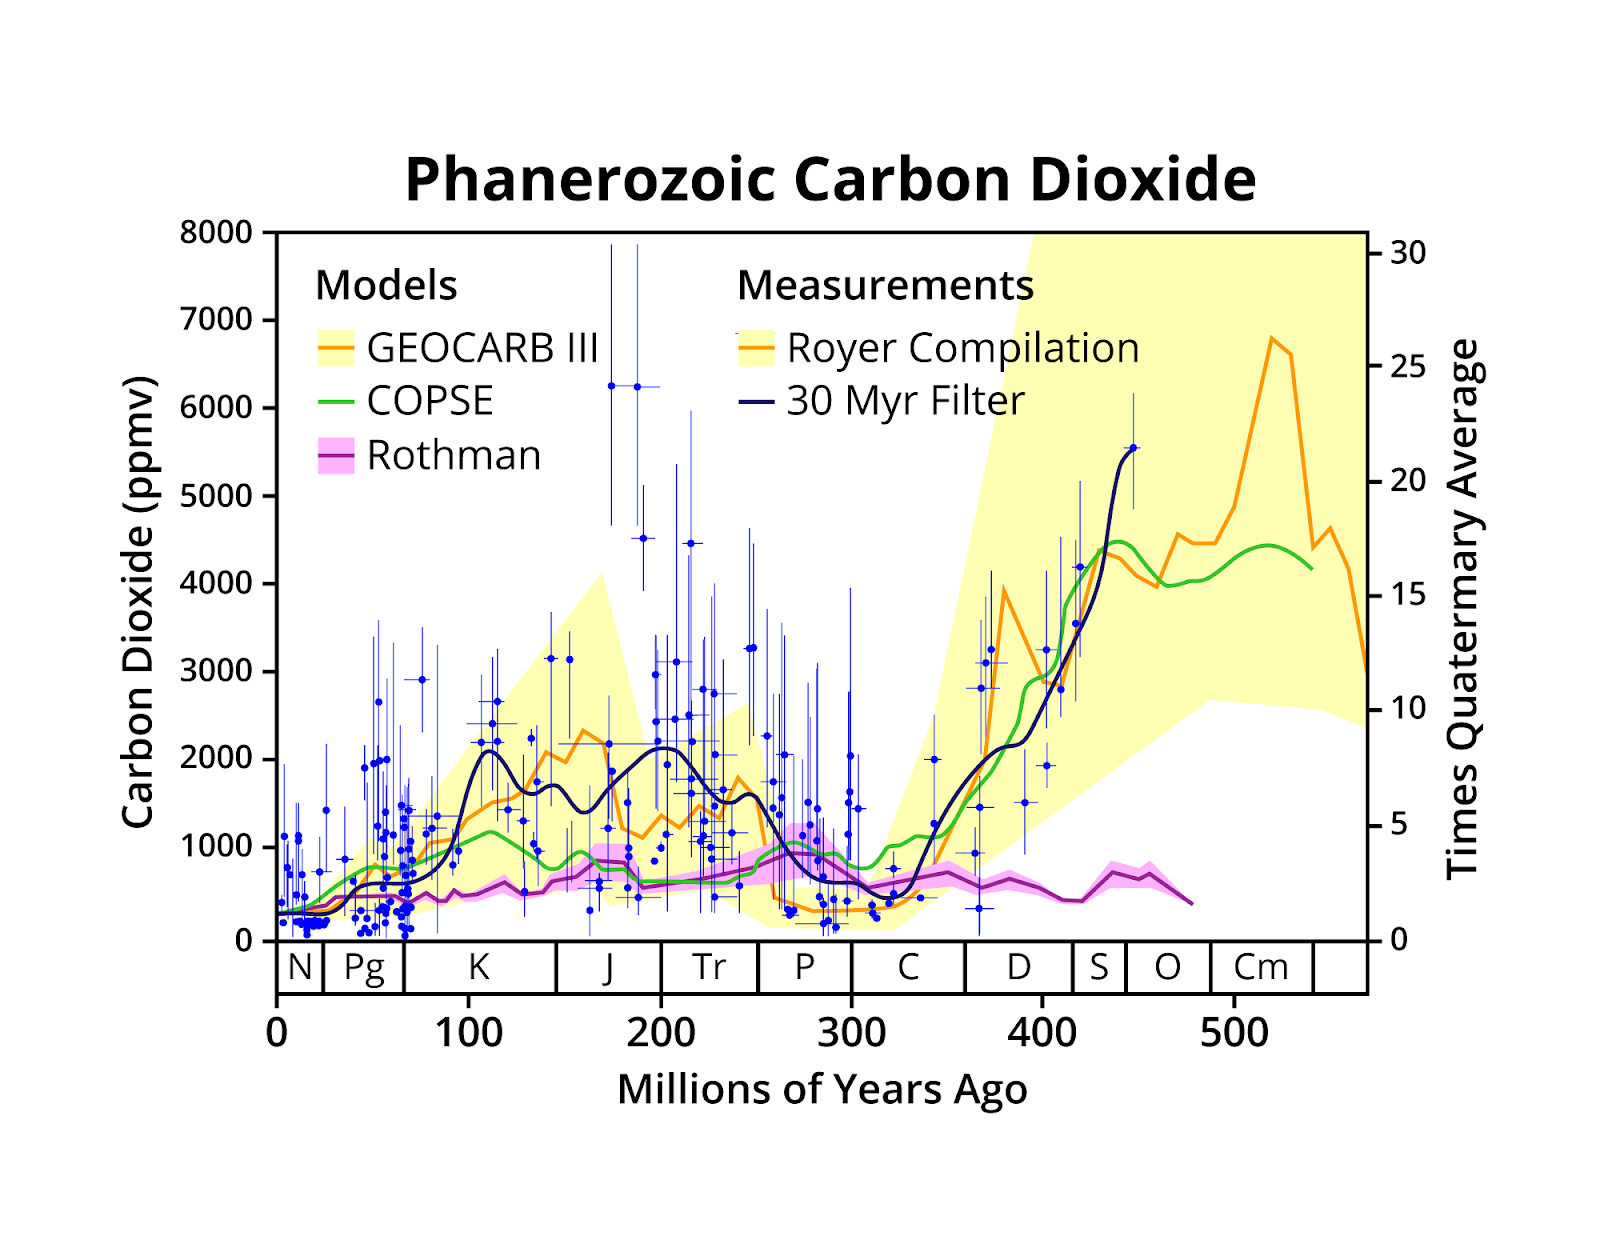 Phanerozic_CO2 (1).png